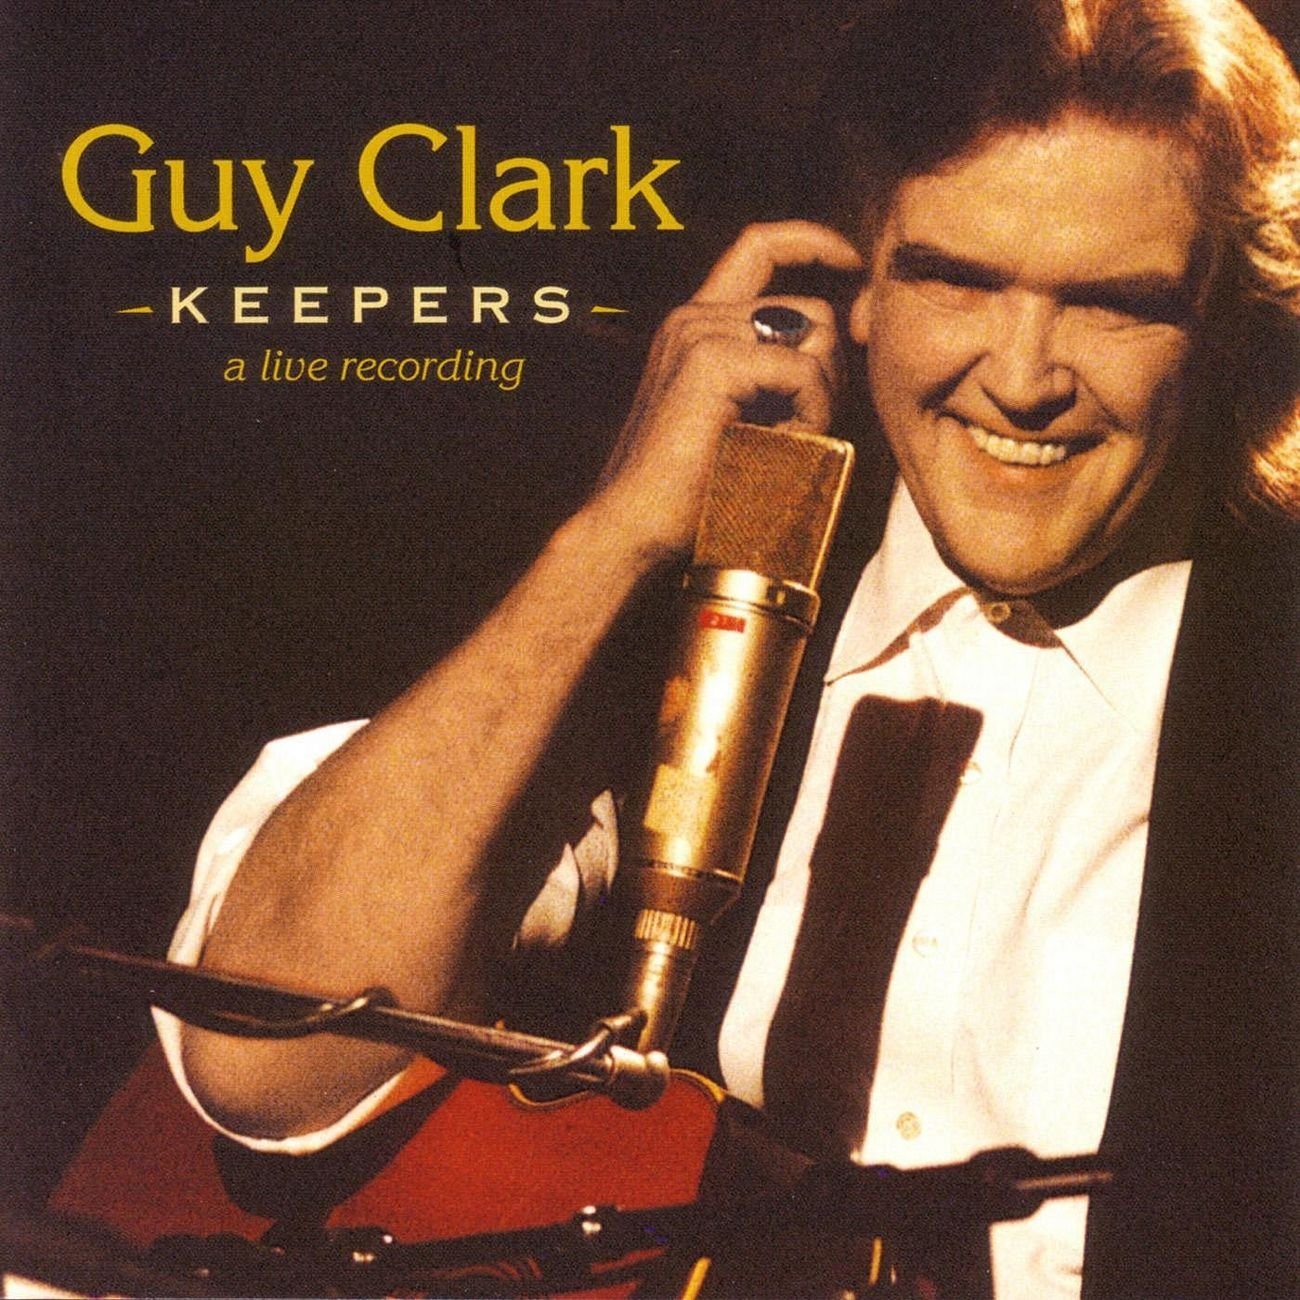 Desperados Waiting For A Train Guy Clark Last Fm